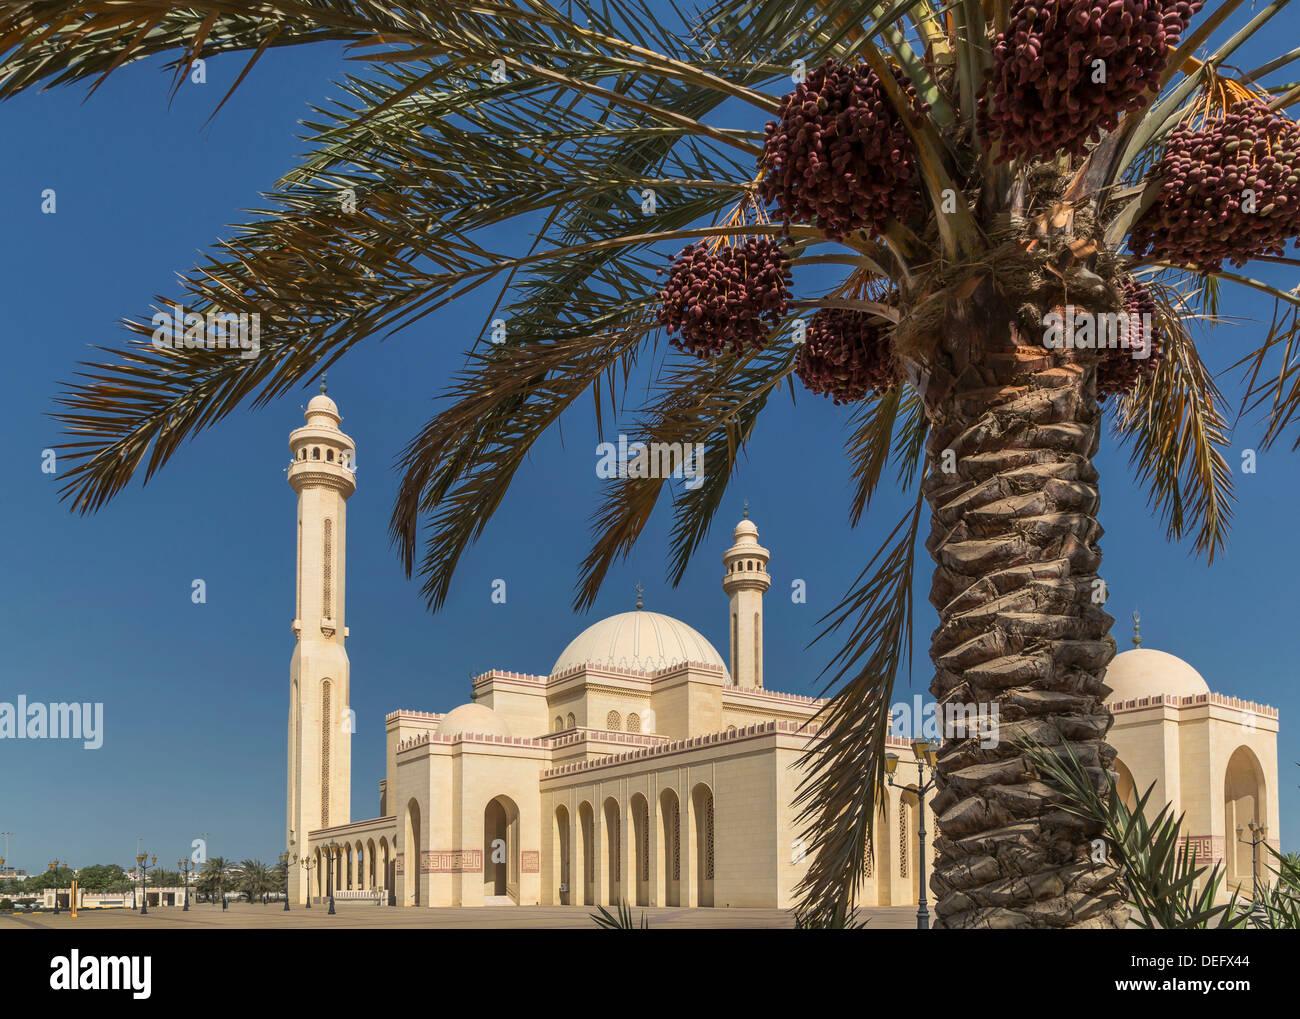 Grande mosquée Al Fateh, Manama, Bahreïn, Moyen-Orient Photo Stock